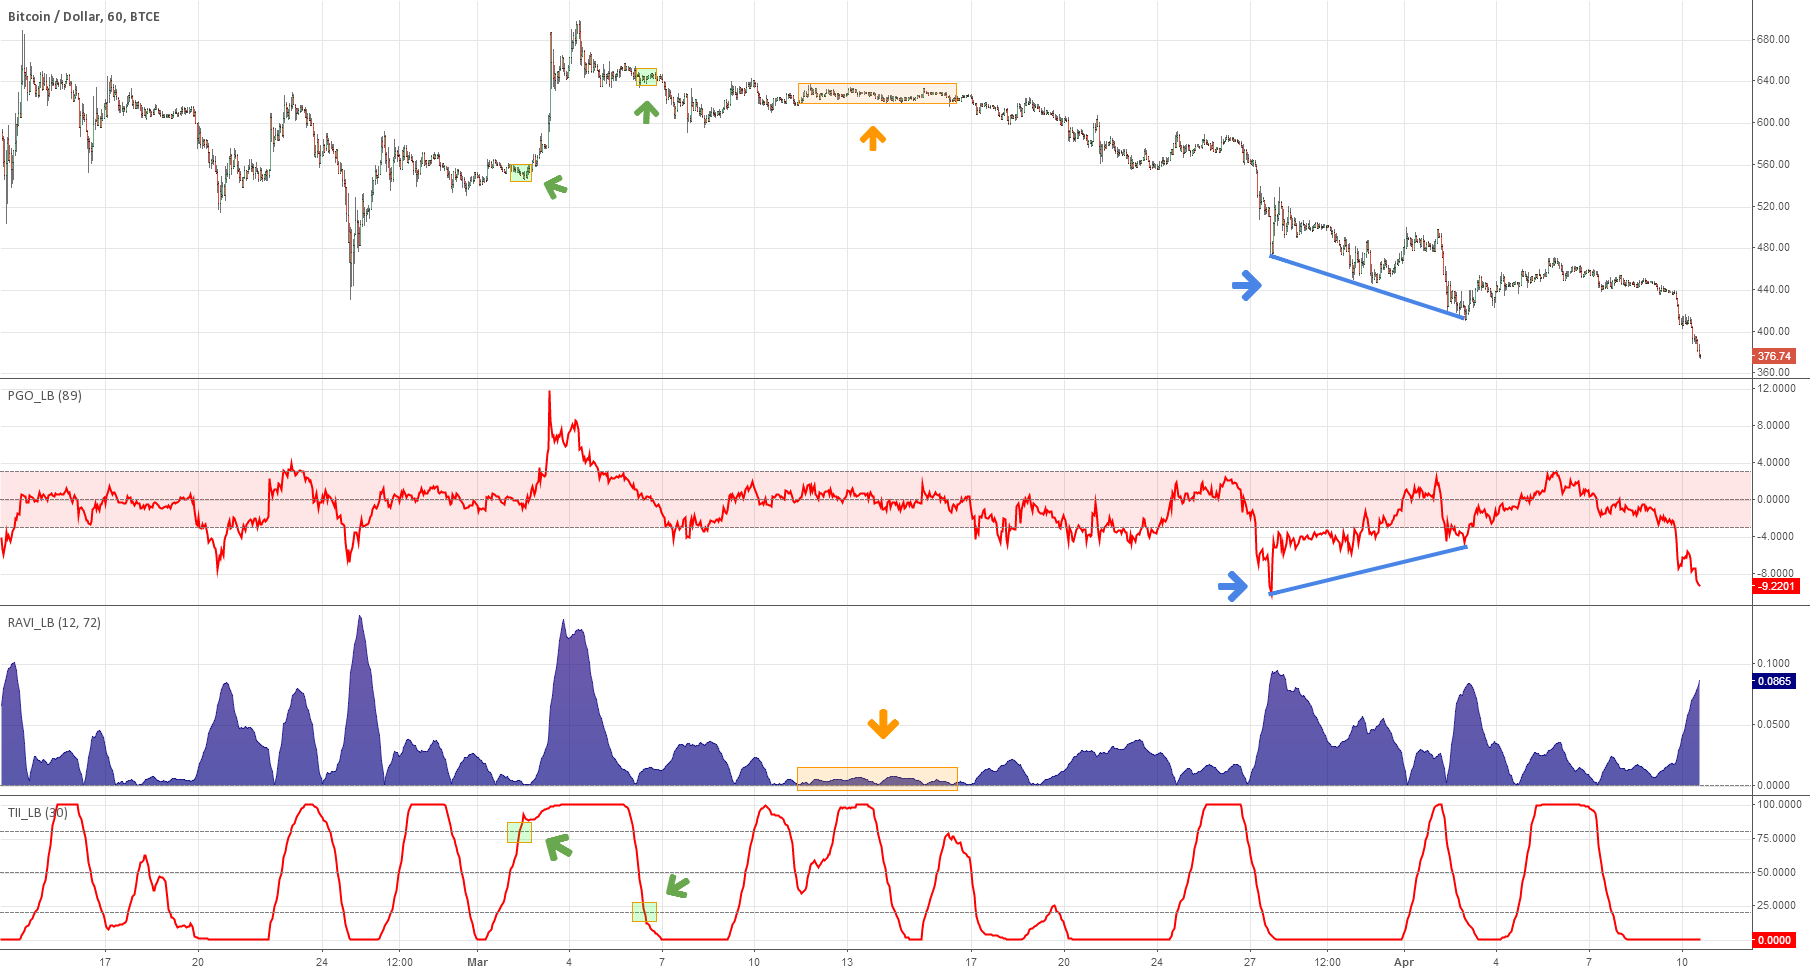 3 new Indicators - PGO / RAVI / TII